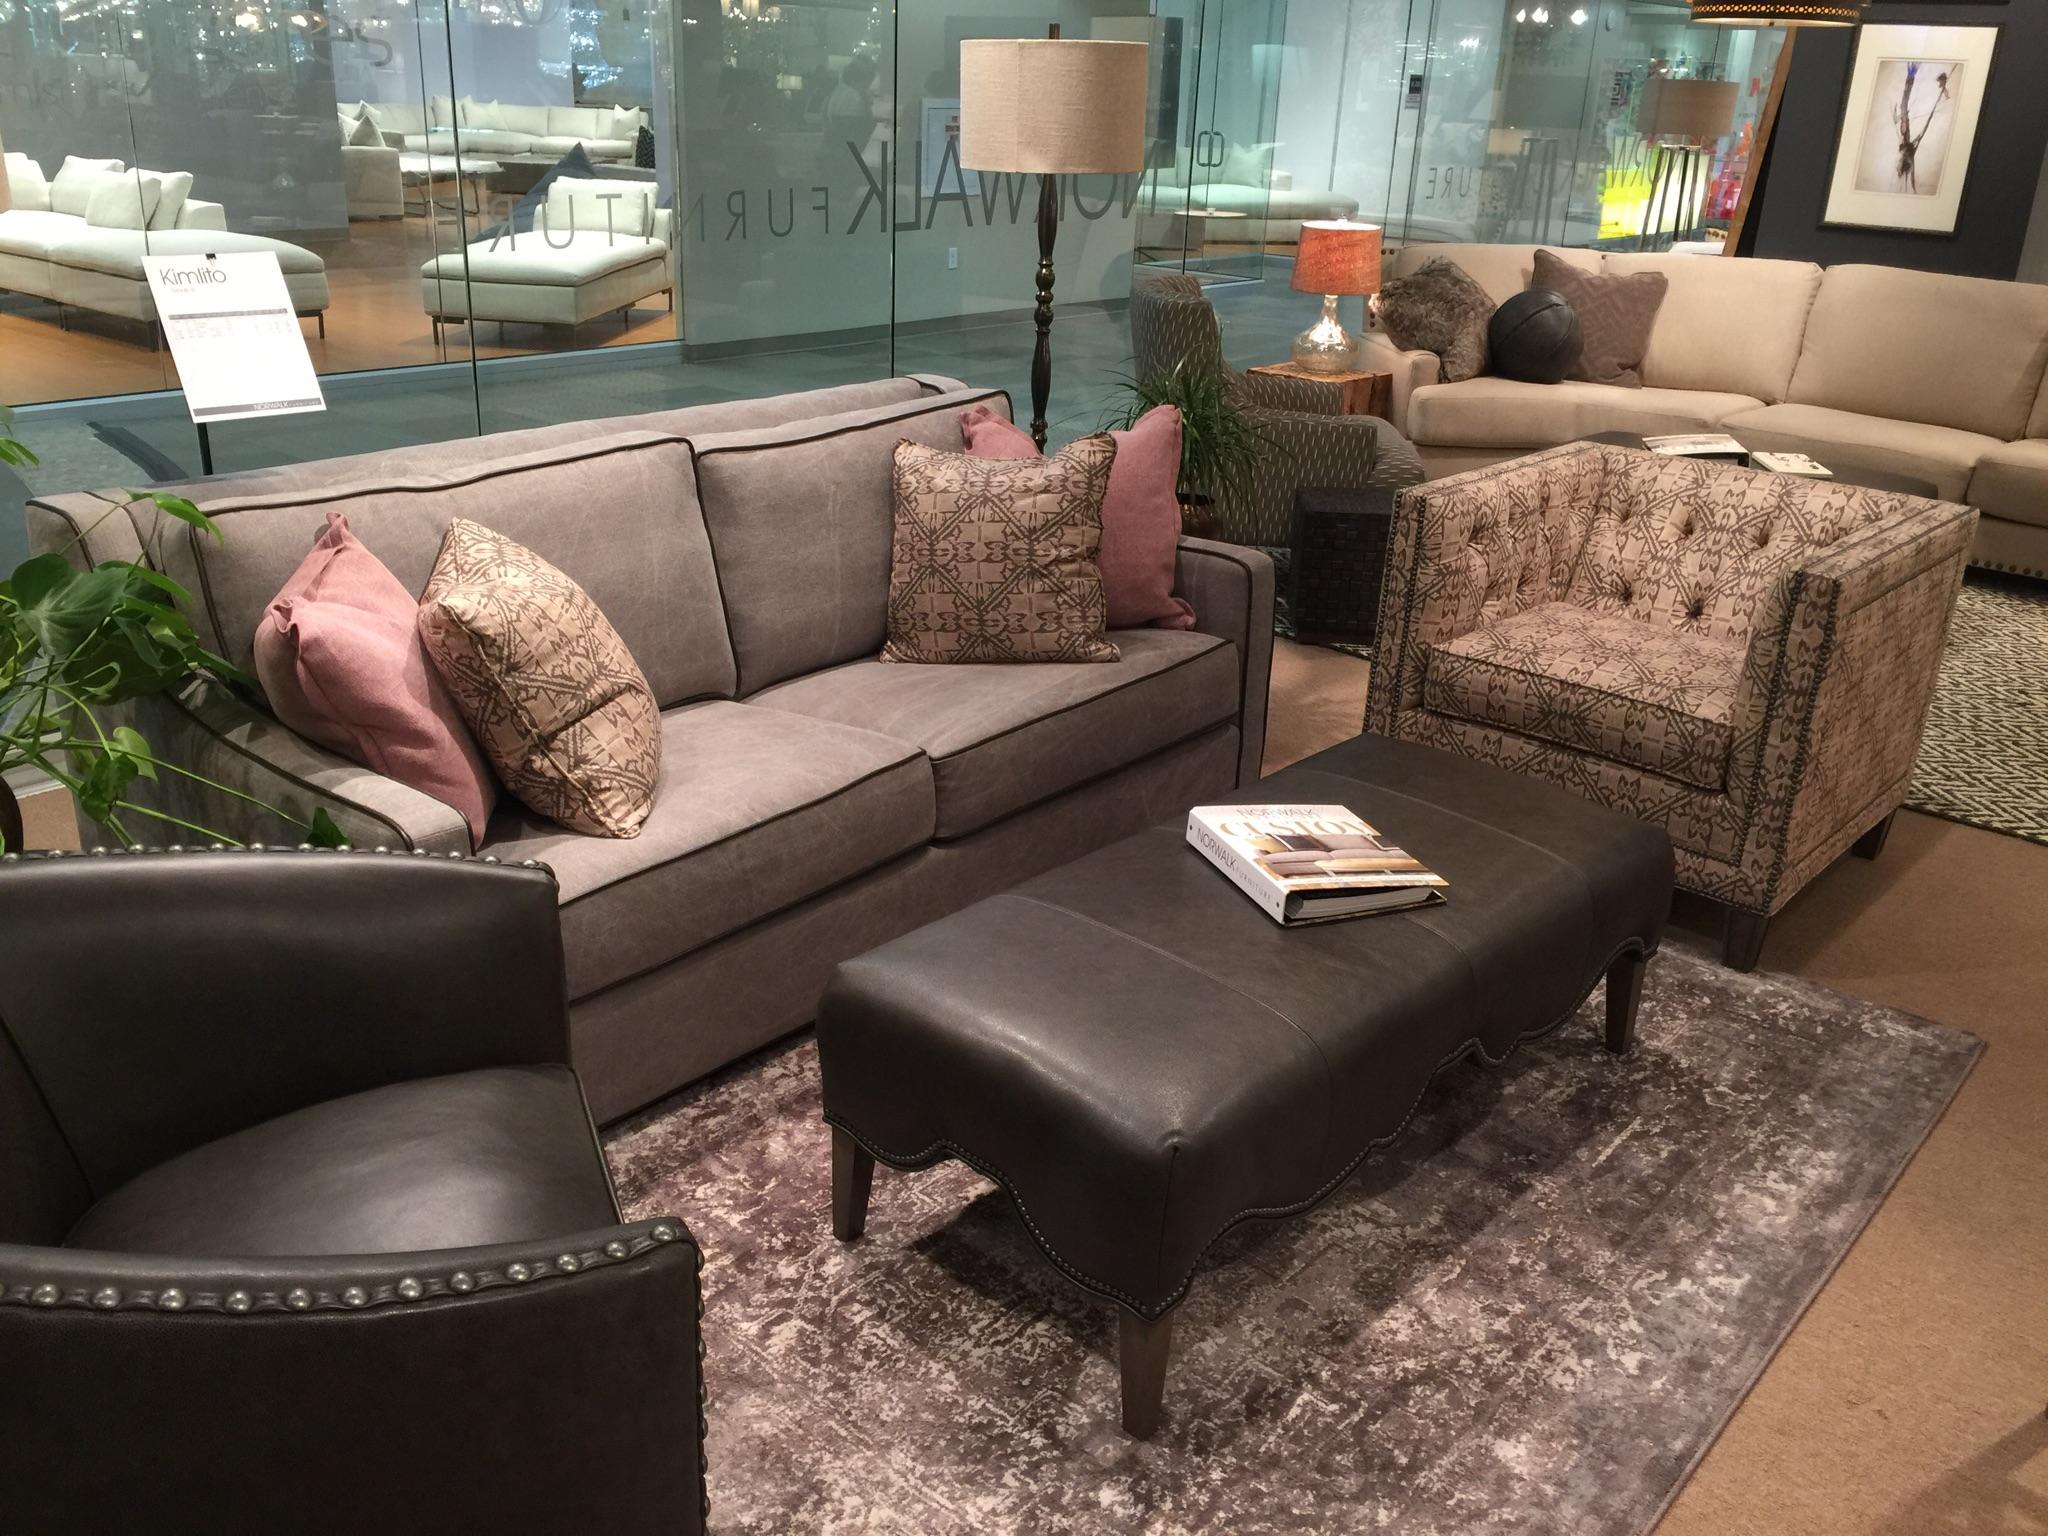 Klimkow Sofa